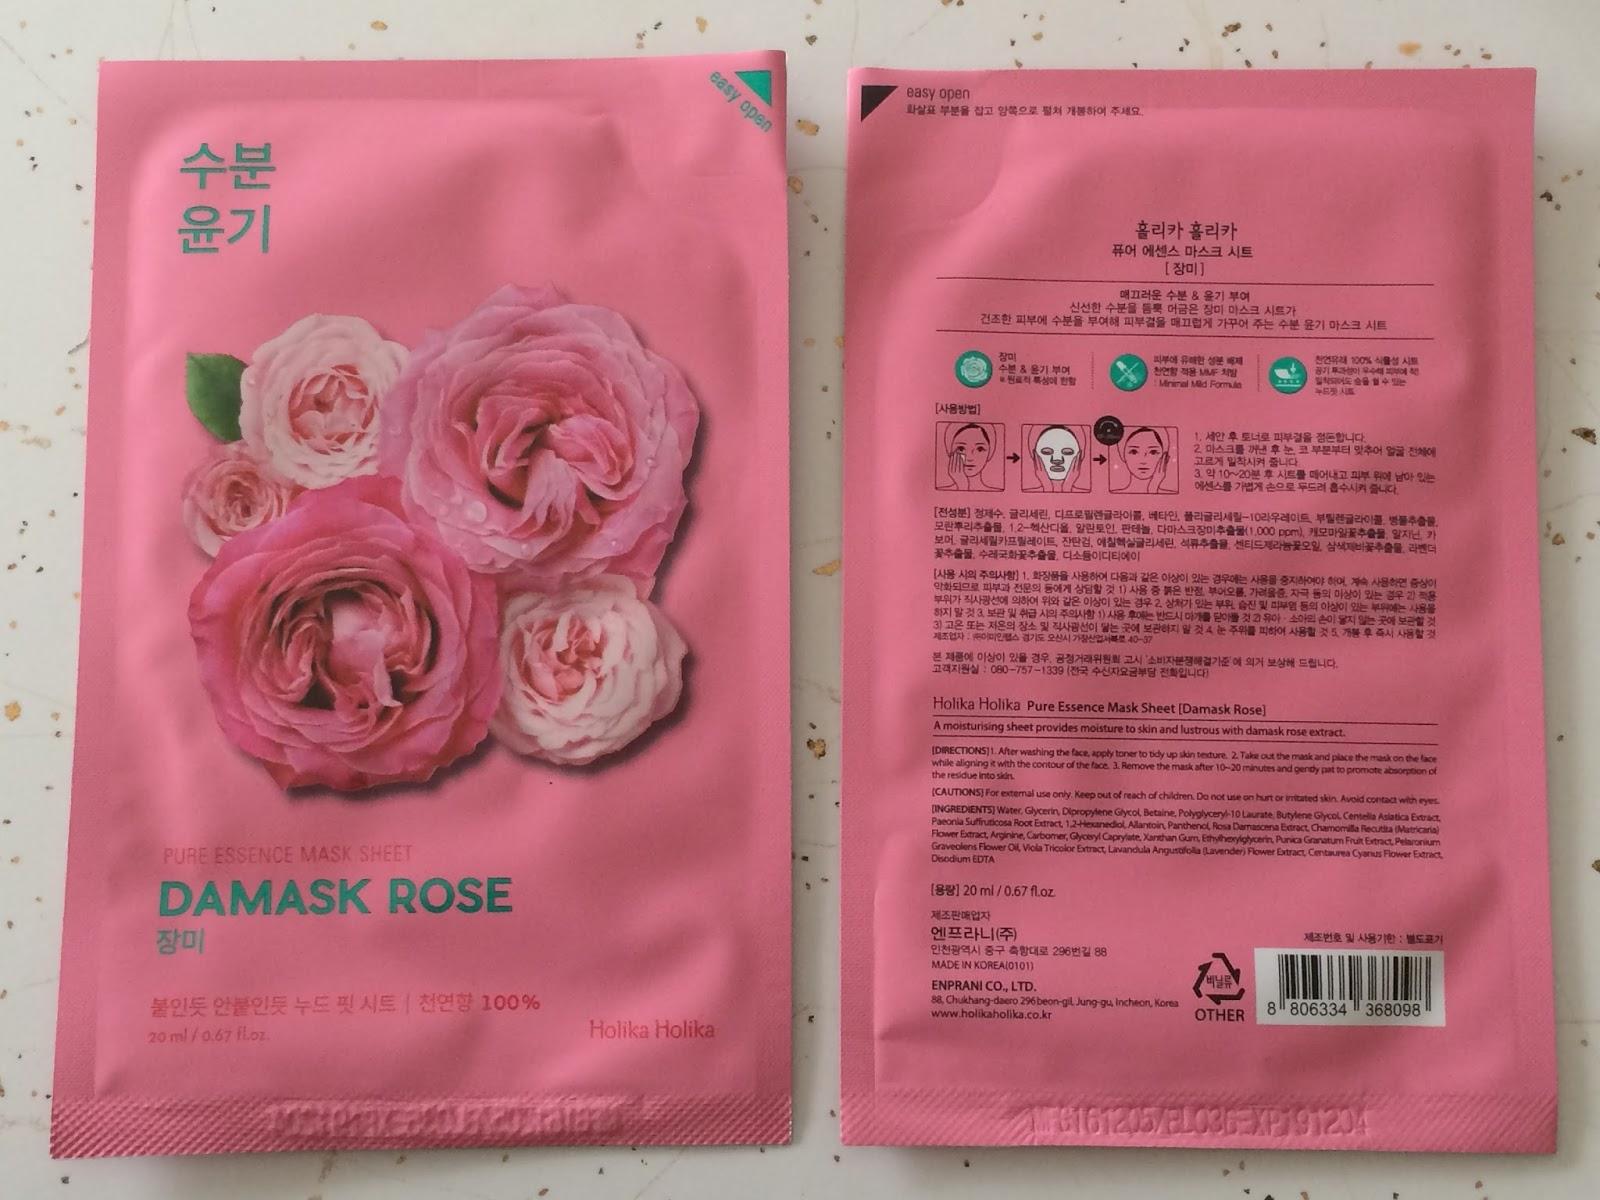 Half Past October Me To Memebox Unboxing Treatyoselffirst 5 Holika Pure Essence Mask Sheet Pearl Damask Rose X2 1 Each